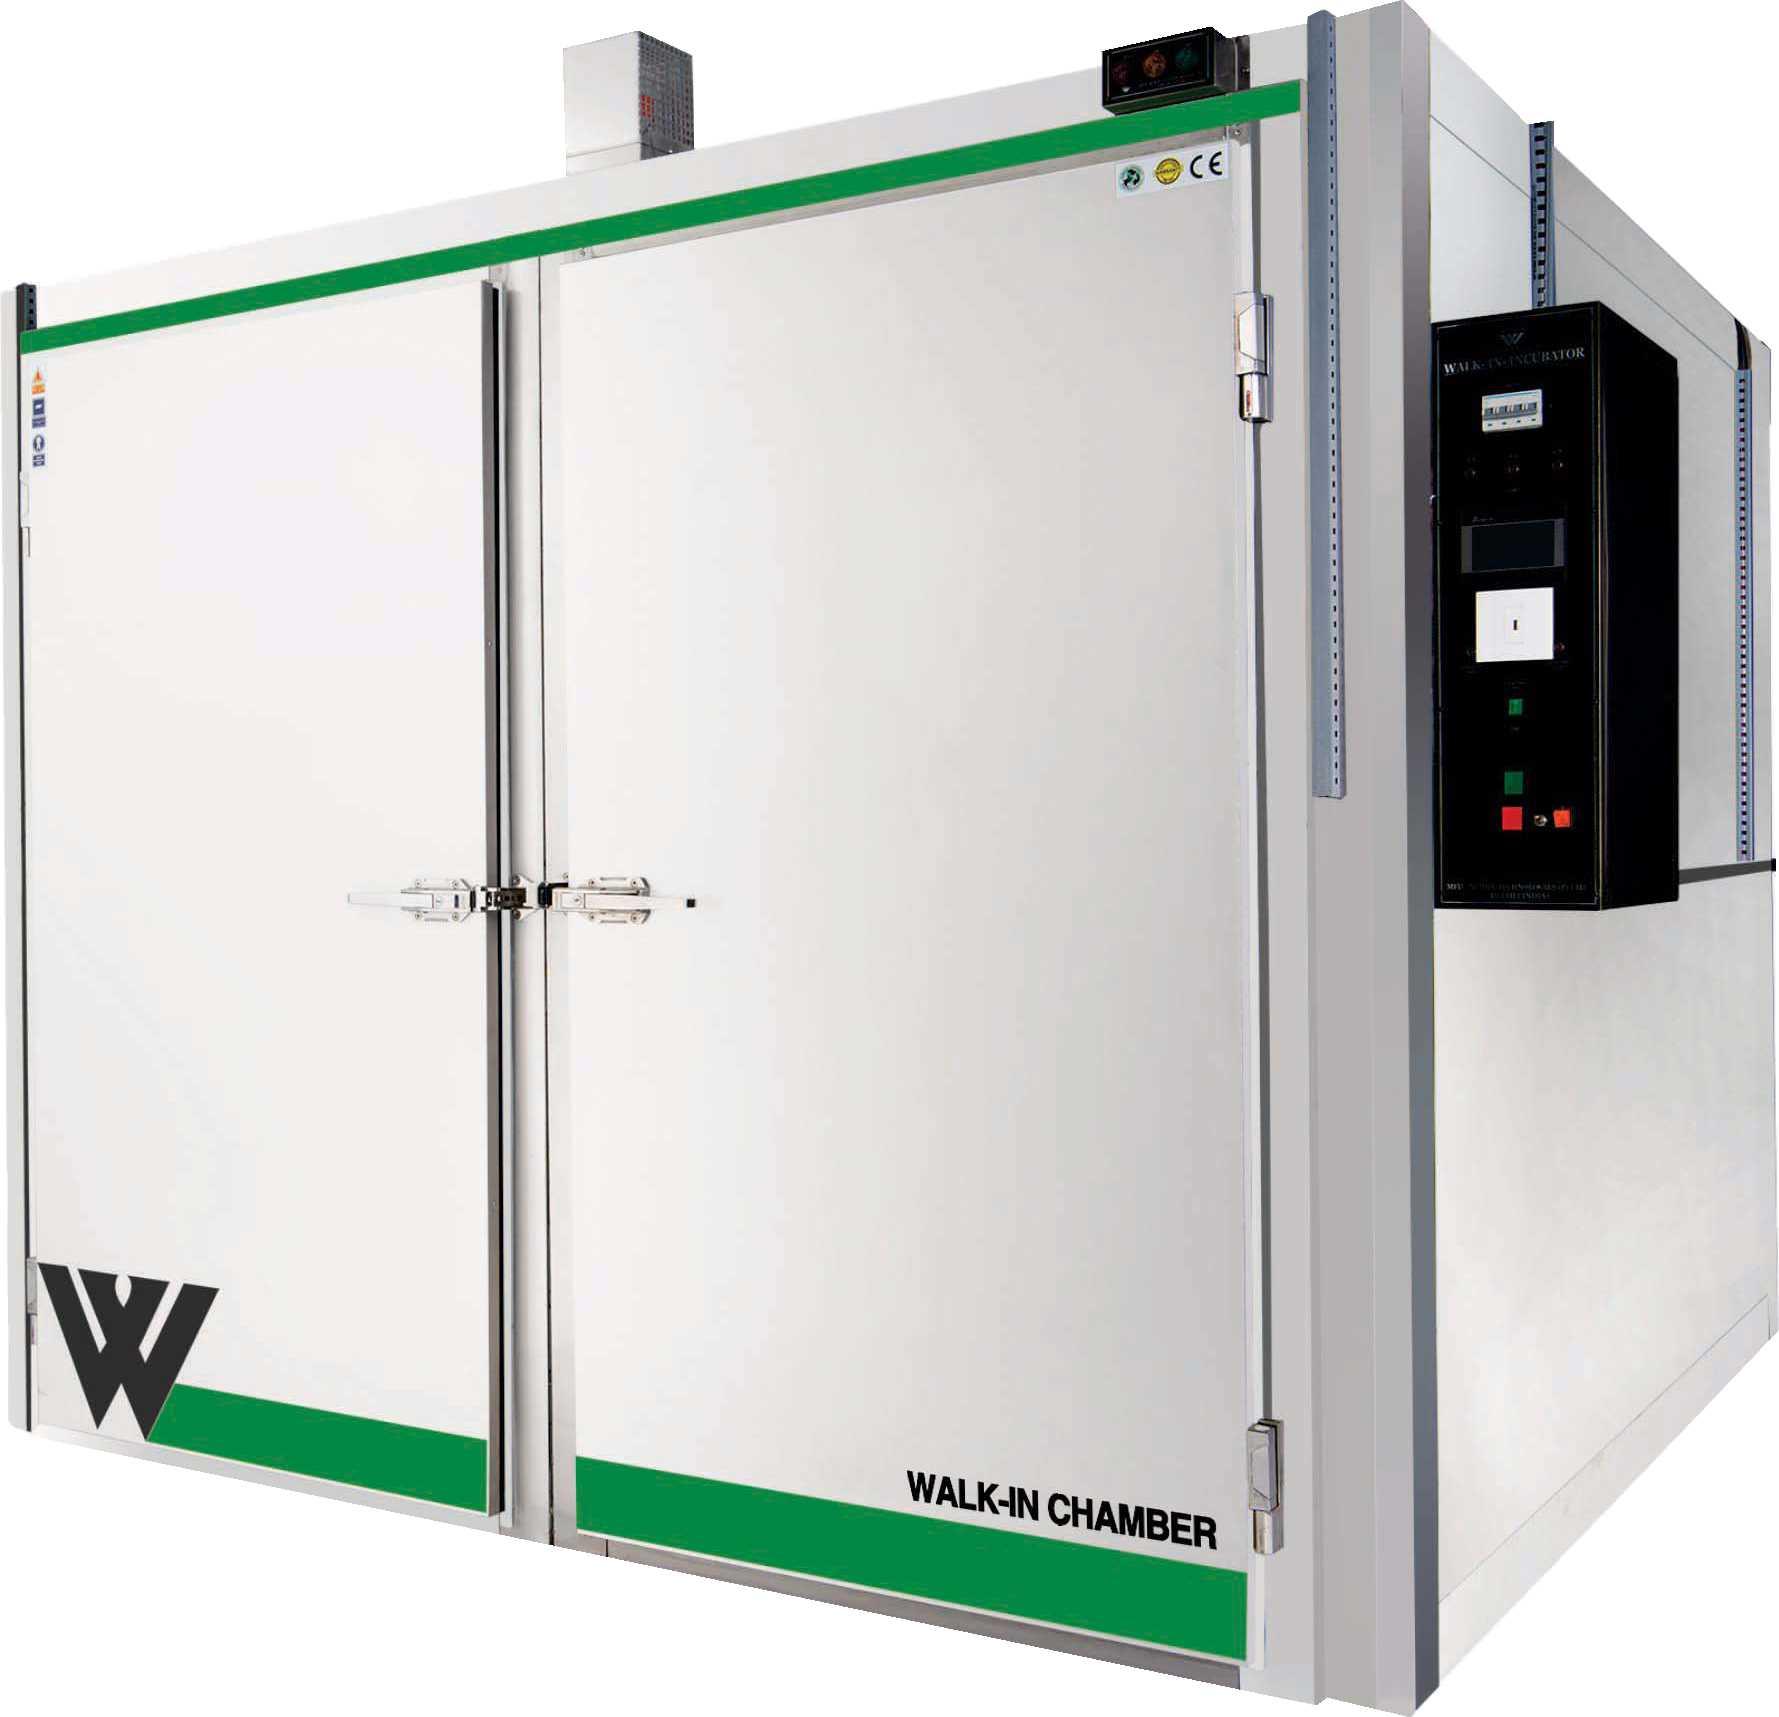 Solar-Panel-Testing-Chambers